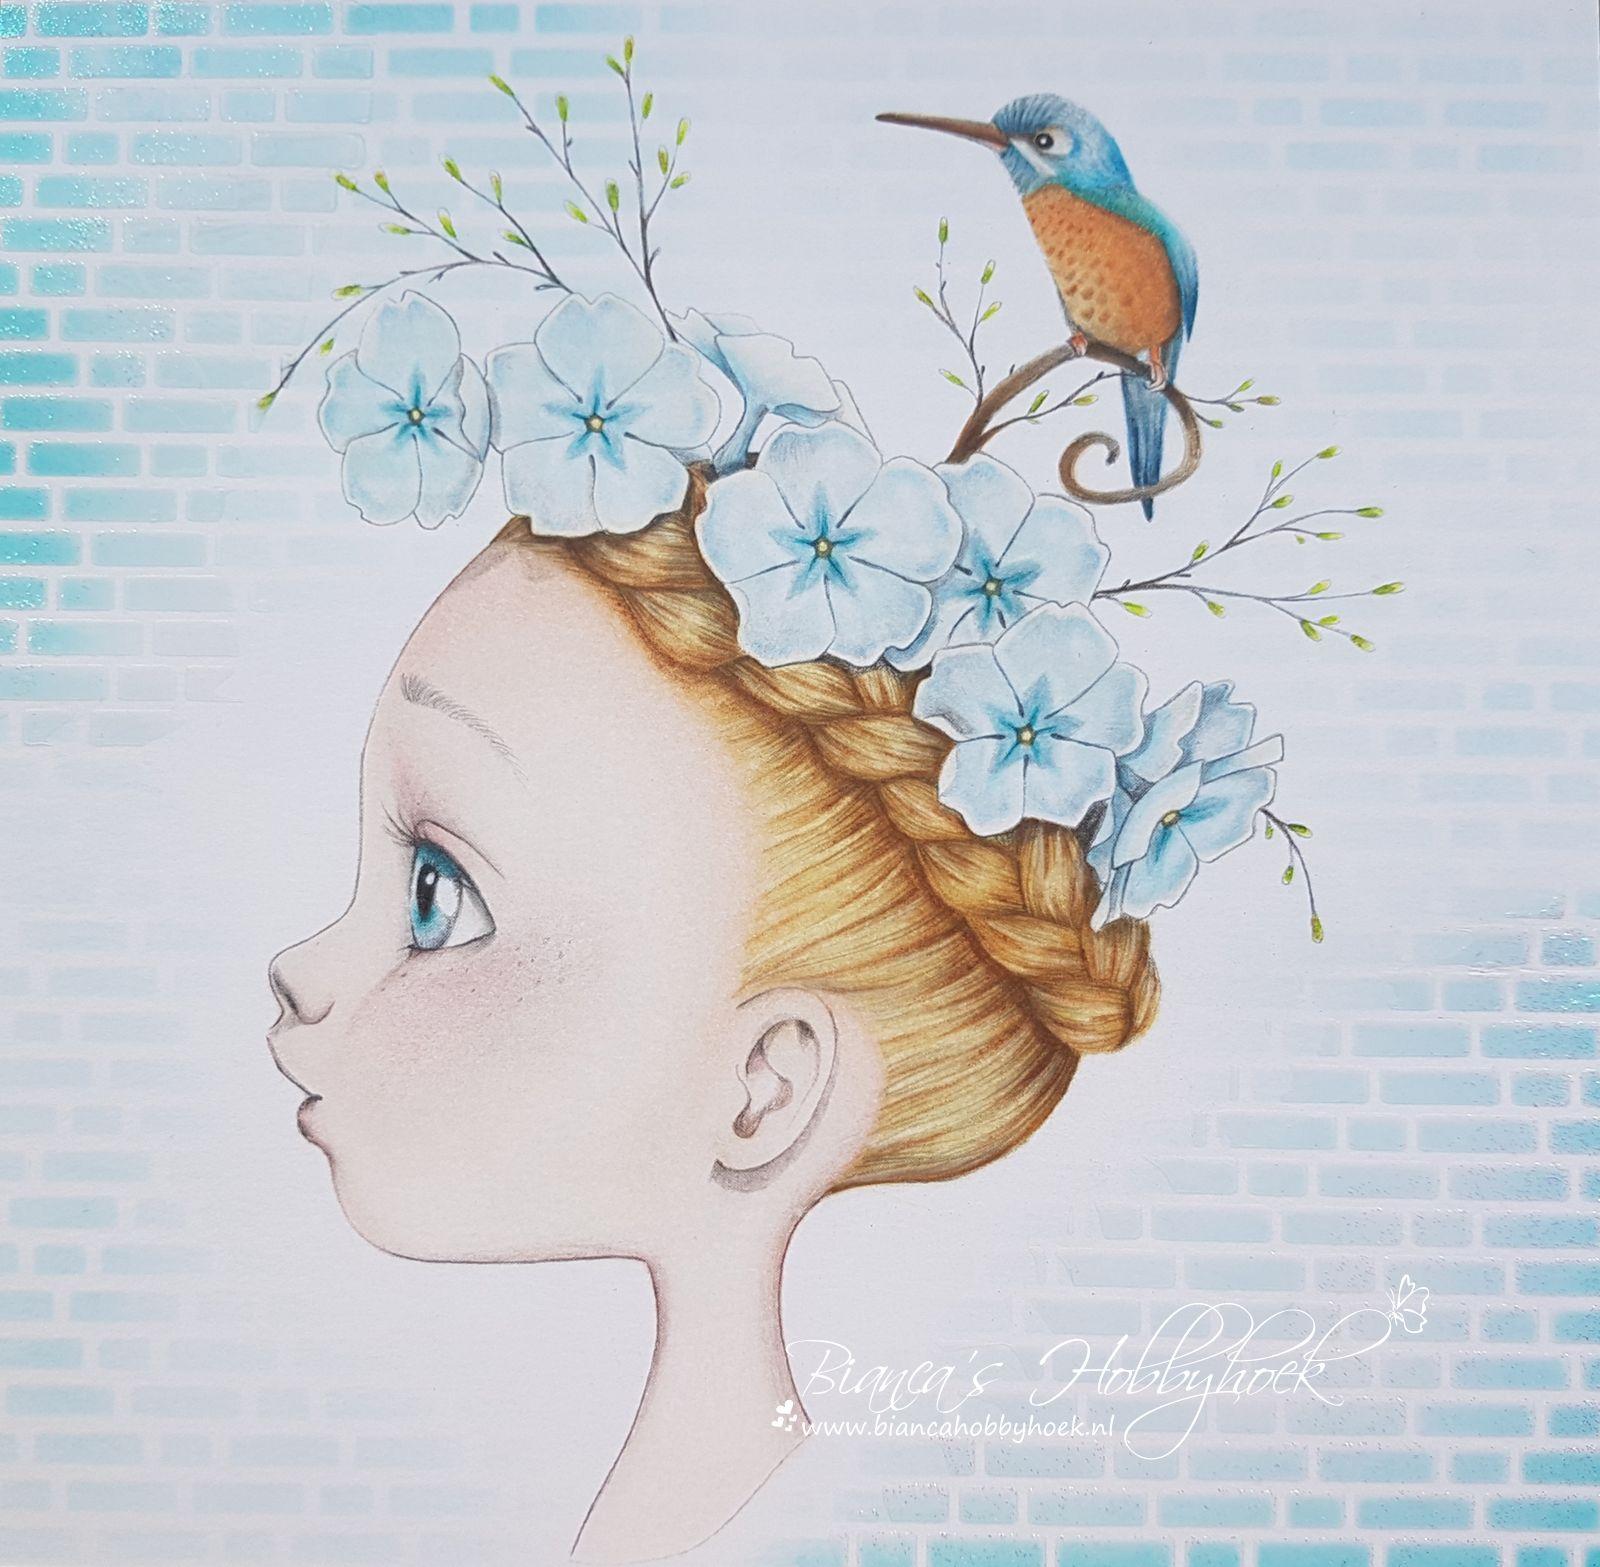 Emanuelle Colin Made By Www Biancahobbyhoek Nl Disney Tekenen Kunst Ideeen Kleur Kunst